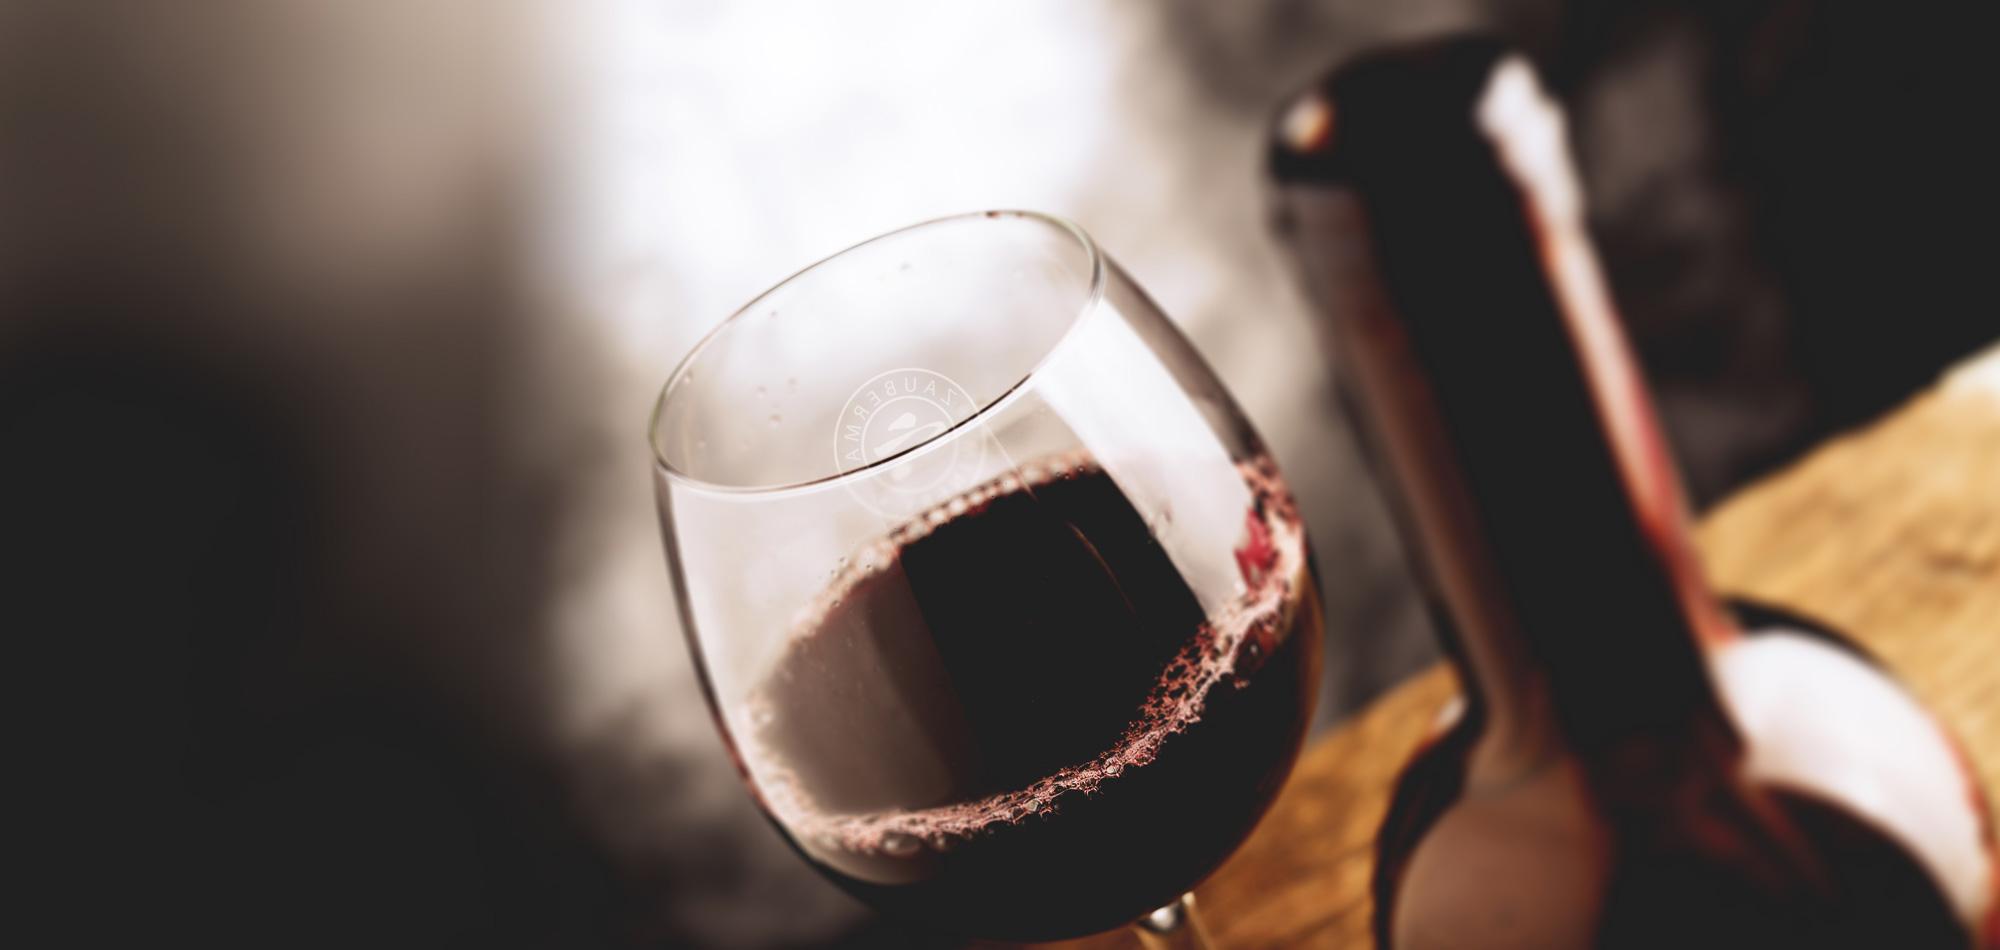 כוס יין יקב זאוברמן